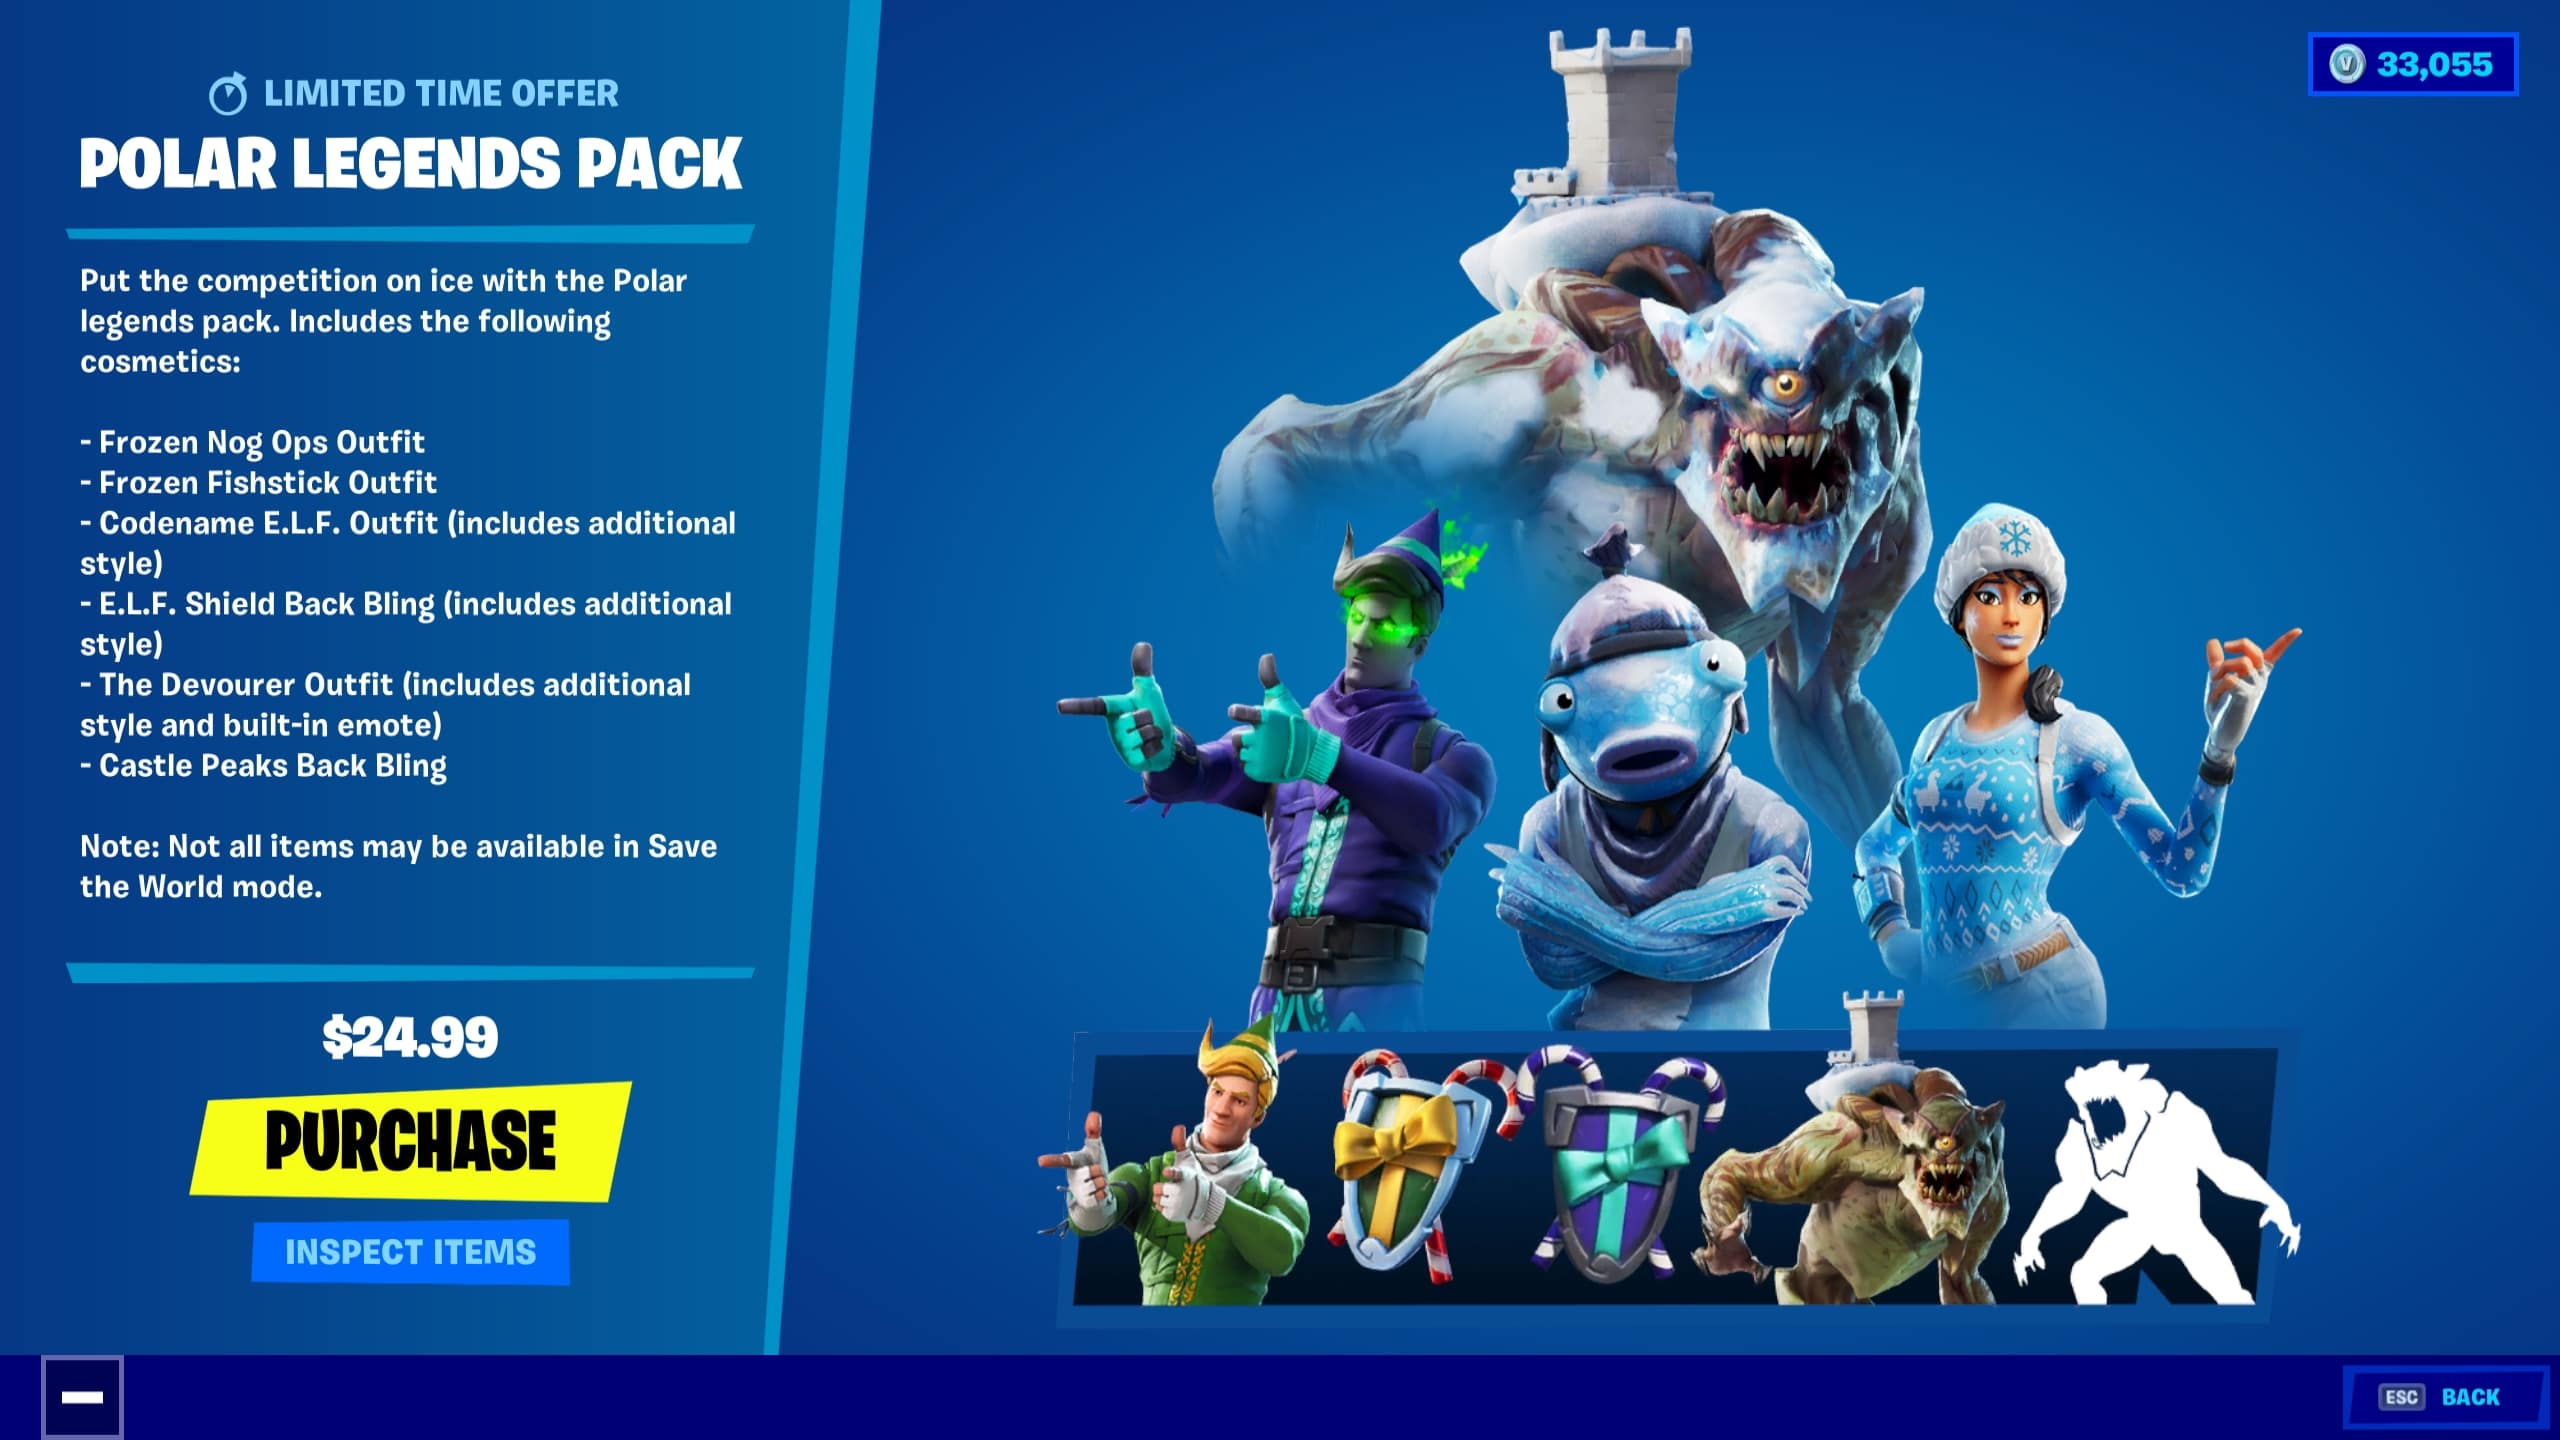 Polar Legends Official Fortnite Pack